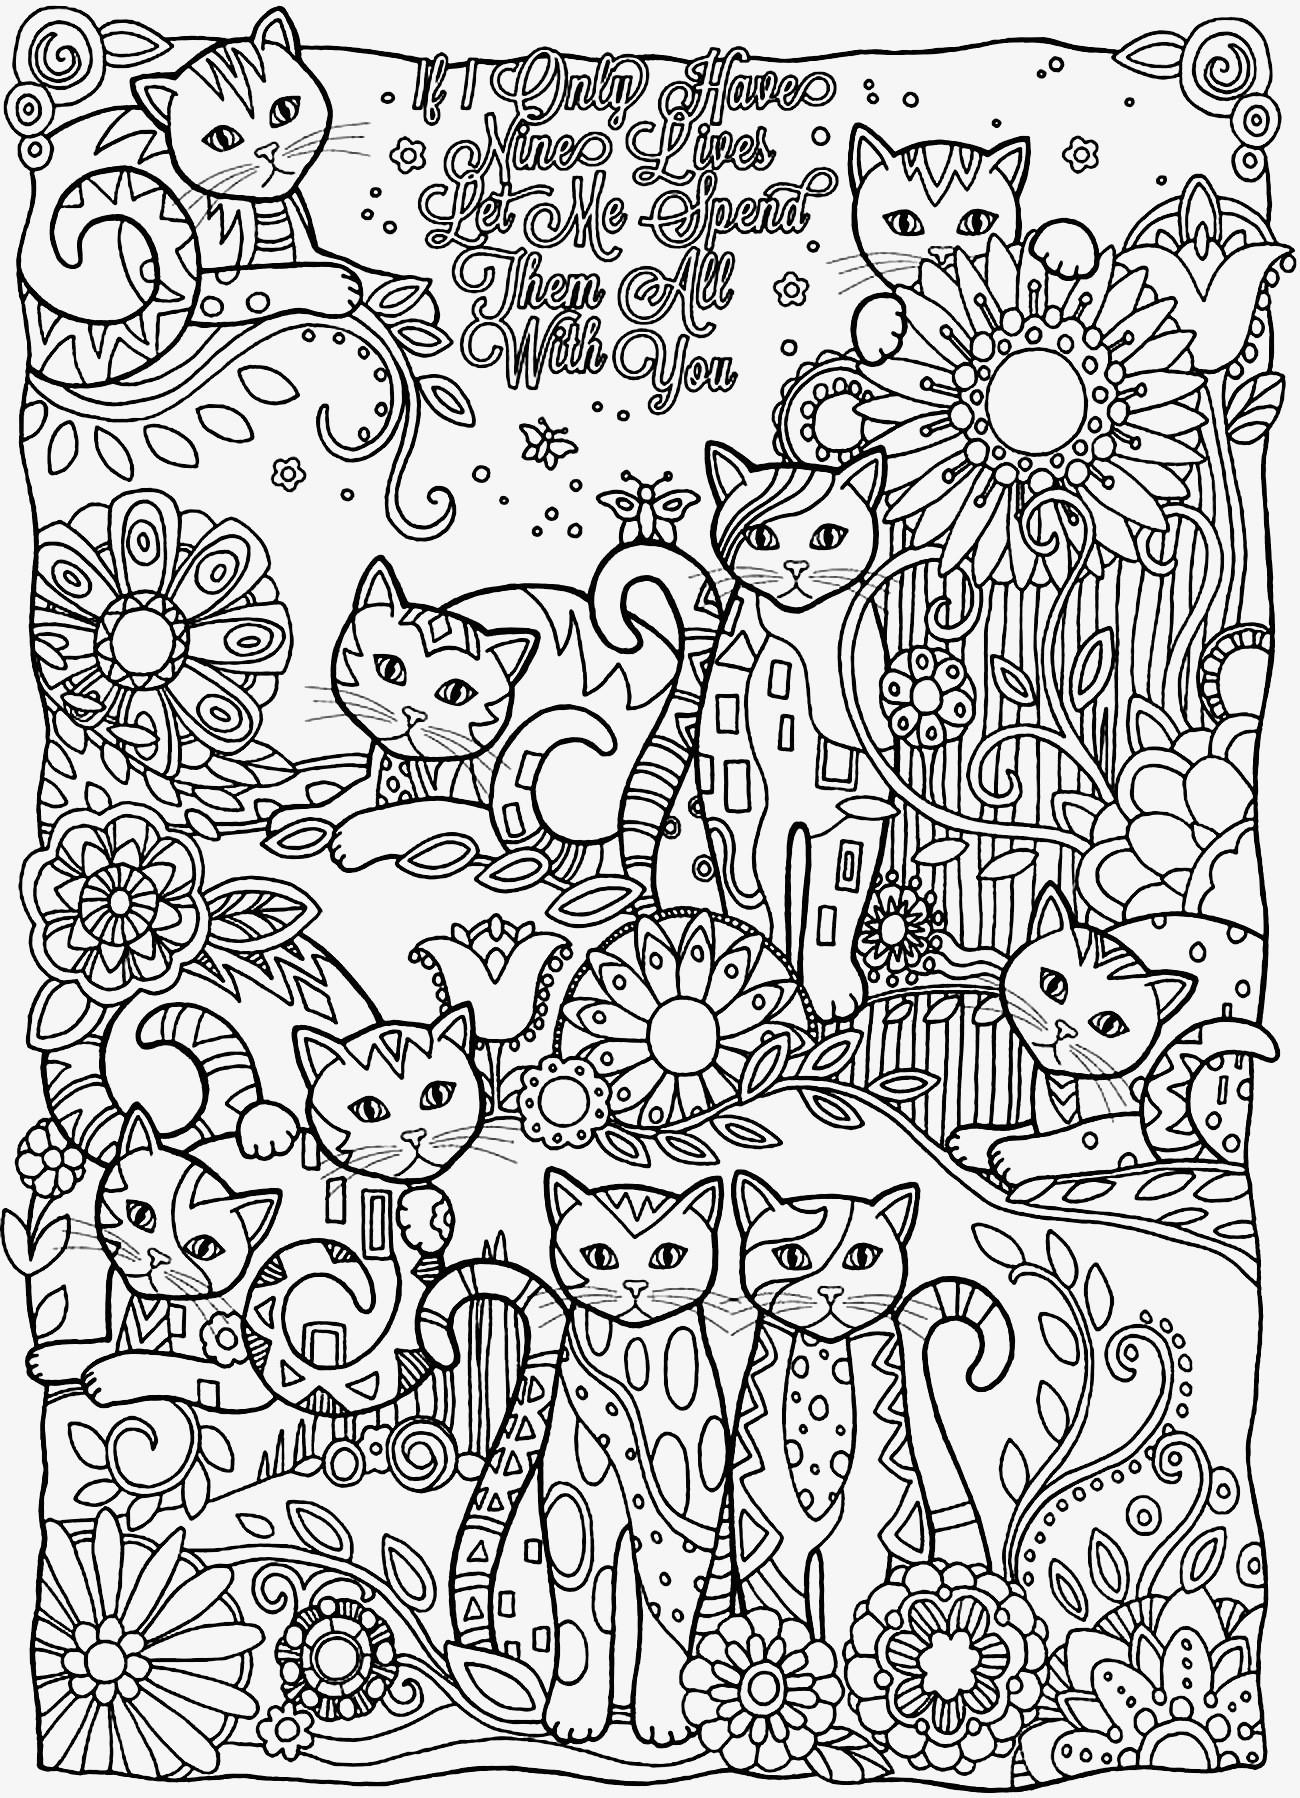 Pilgrim Indian Coloring Pages Pilgrim And Indian Coloring Pages Inspirational 52 Inspirational